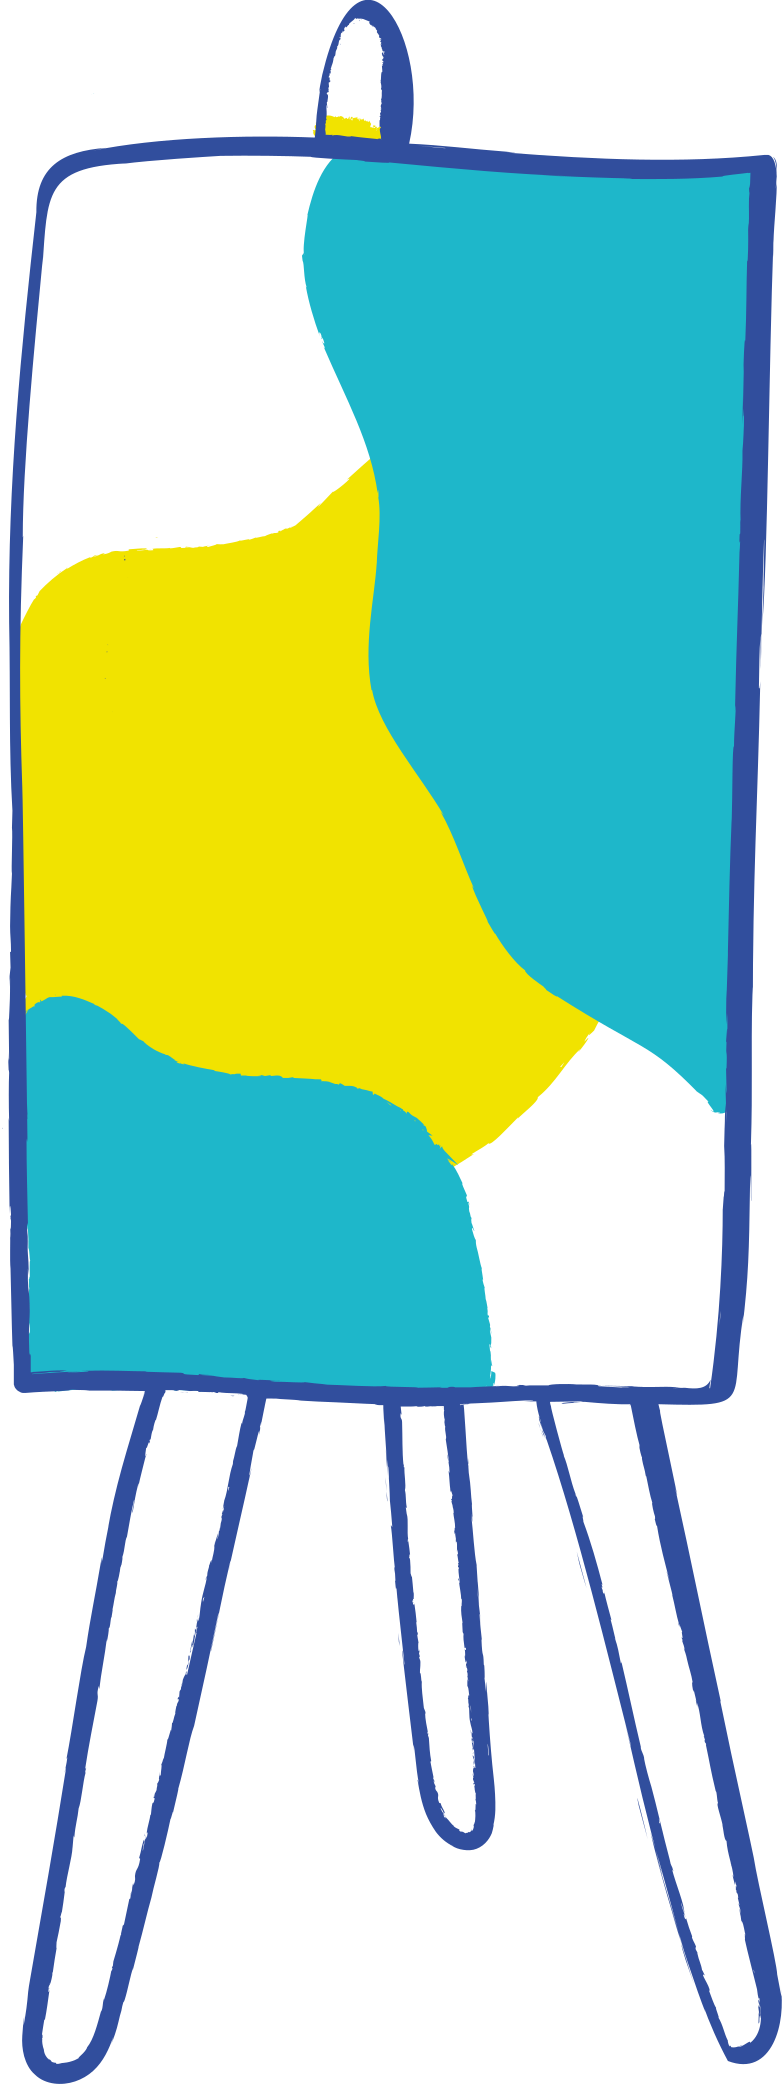 Cavalete Clipart illustration in PNG, SVG